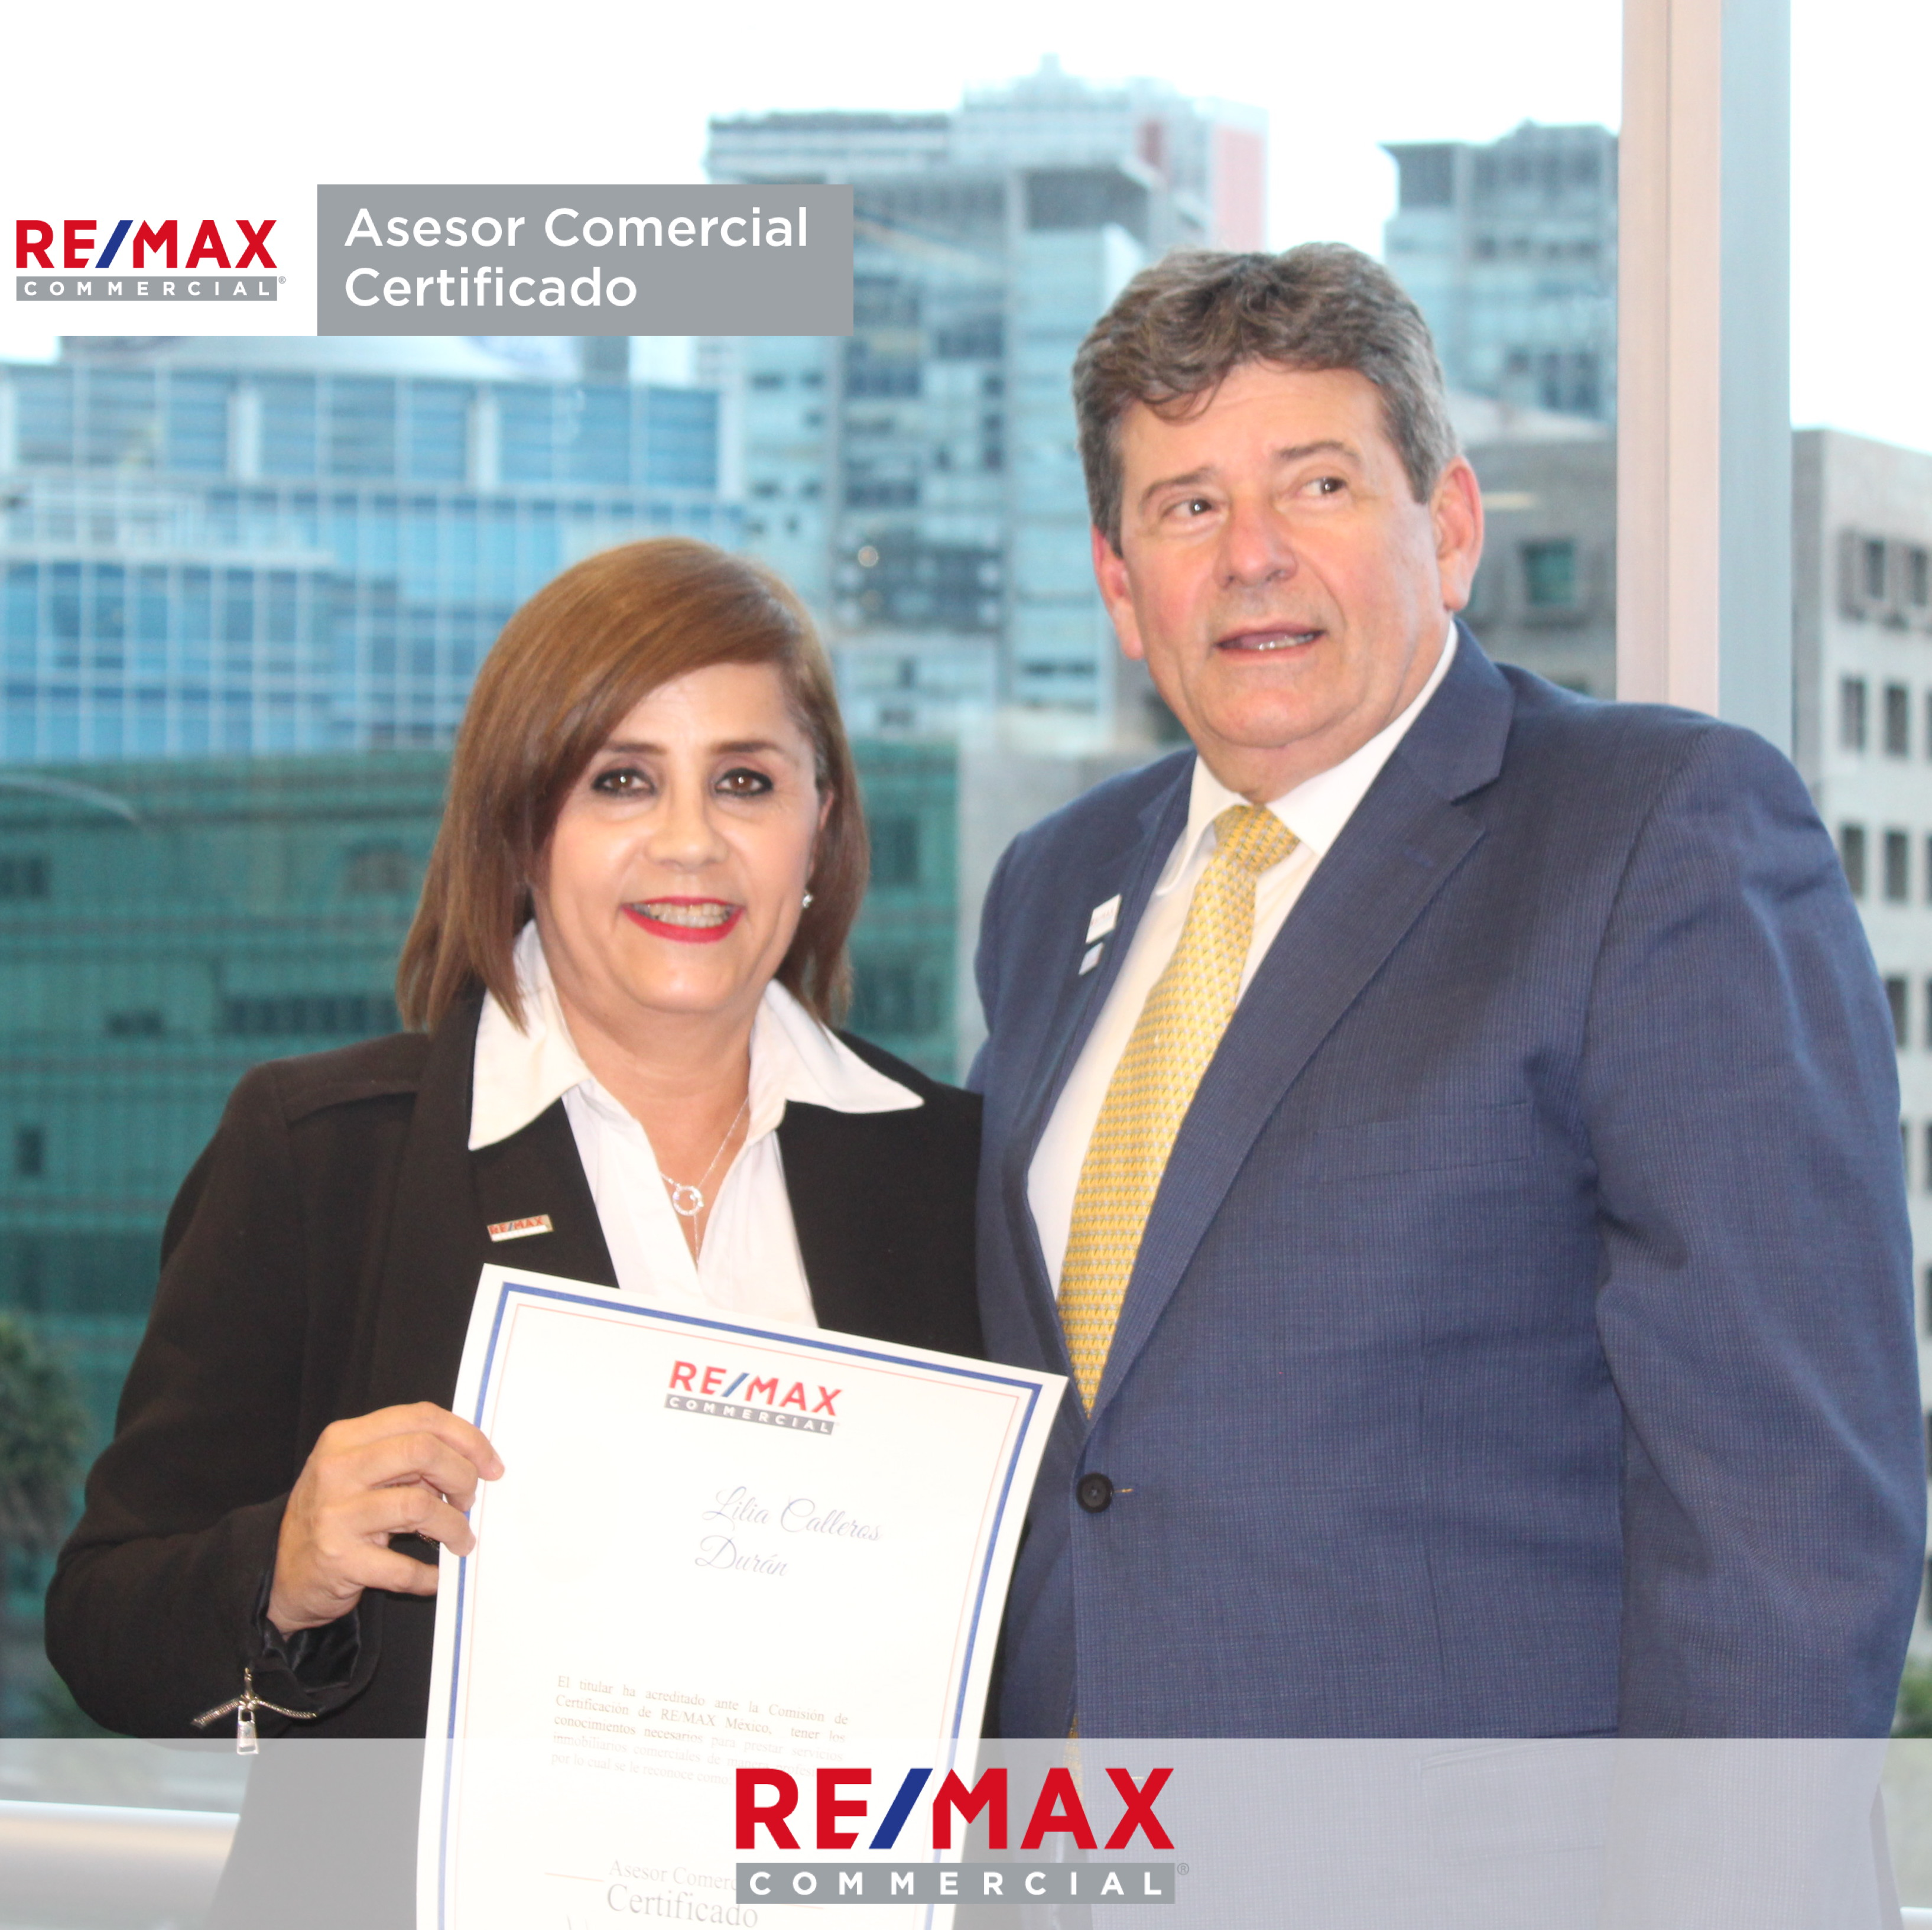 06_Certificacion_comercial_comprar_rentar_vender_casa_departamento_franquicias_inmobiliarias_REMAX_mexico_propiedades_comerciales_terrenos_bodegas